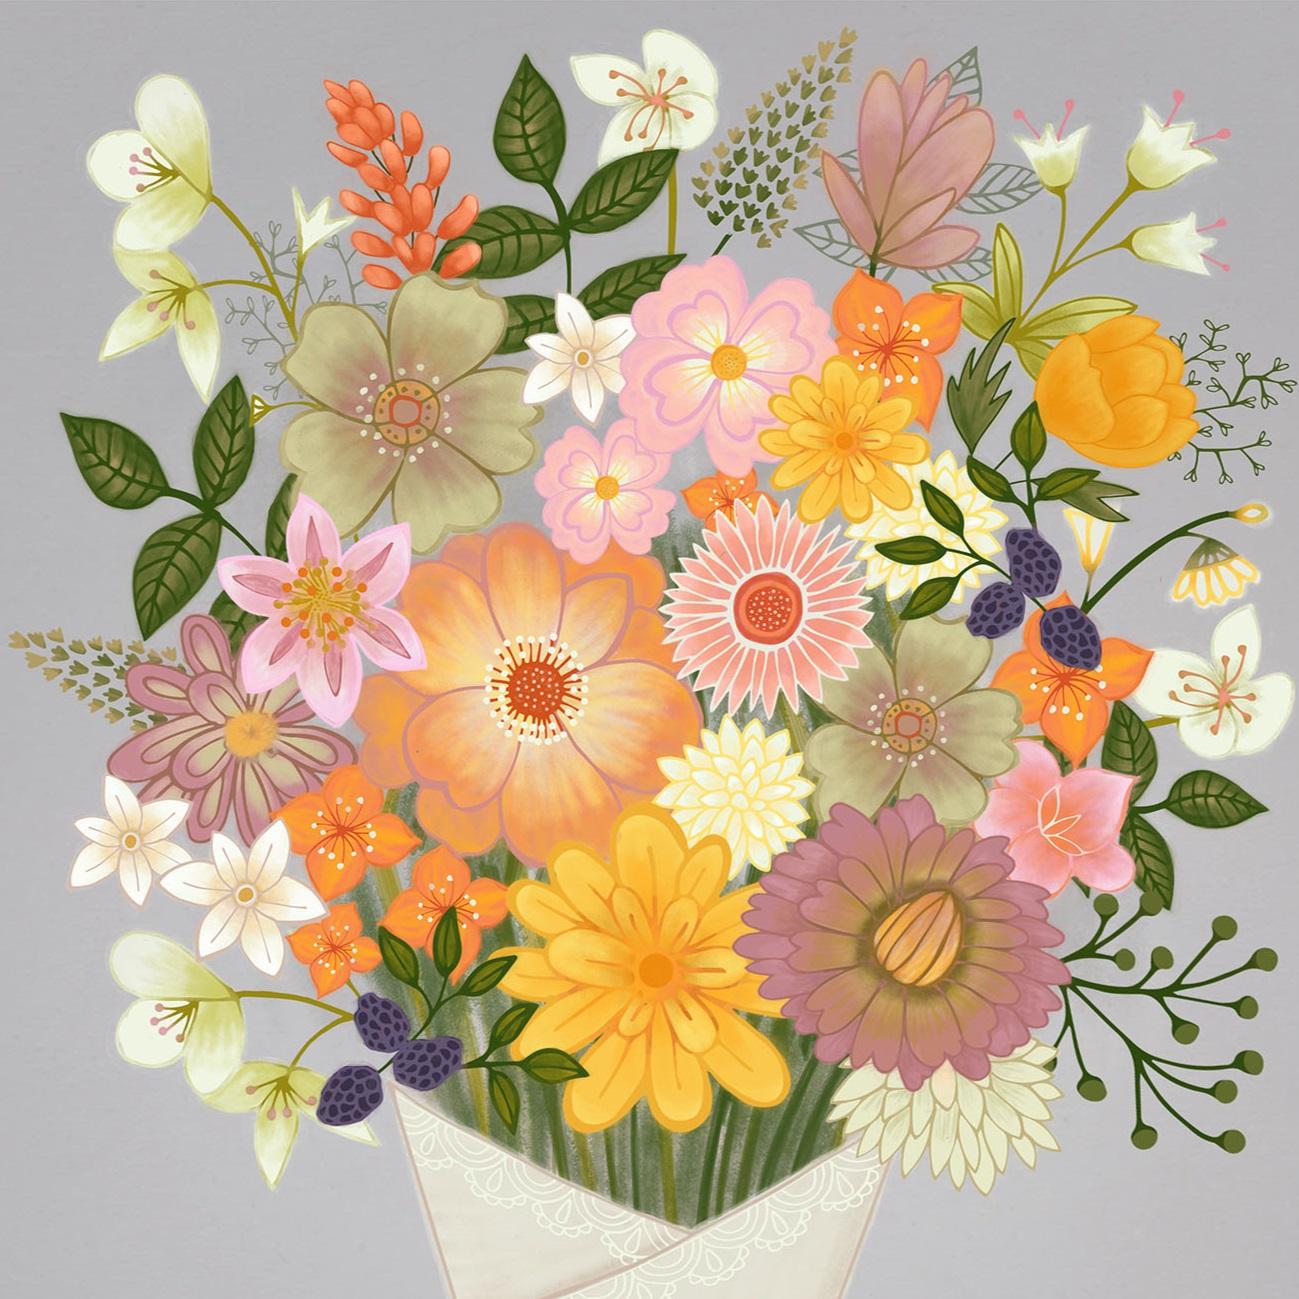 HM_18013_Garden Flowers.jpg